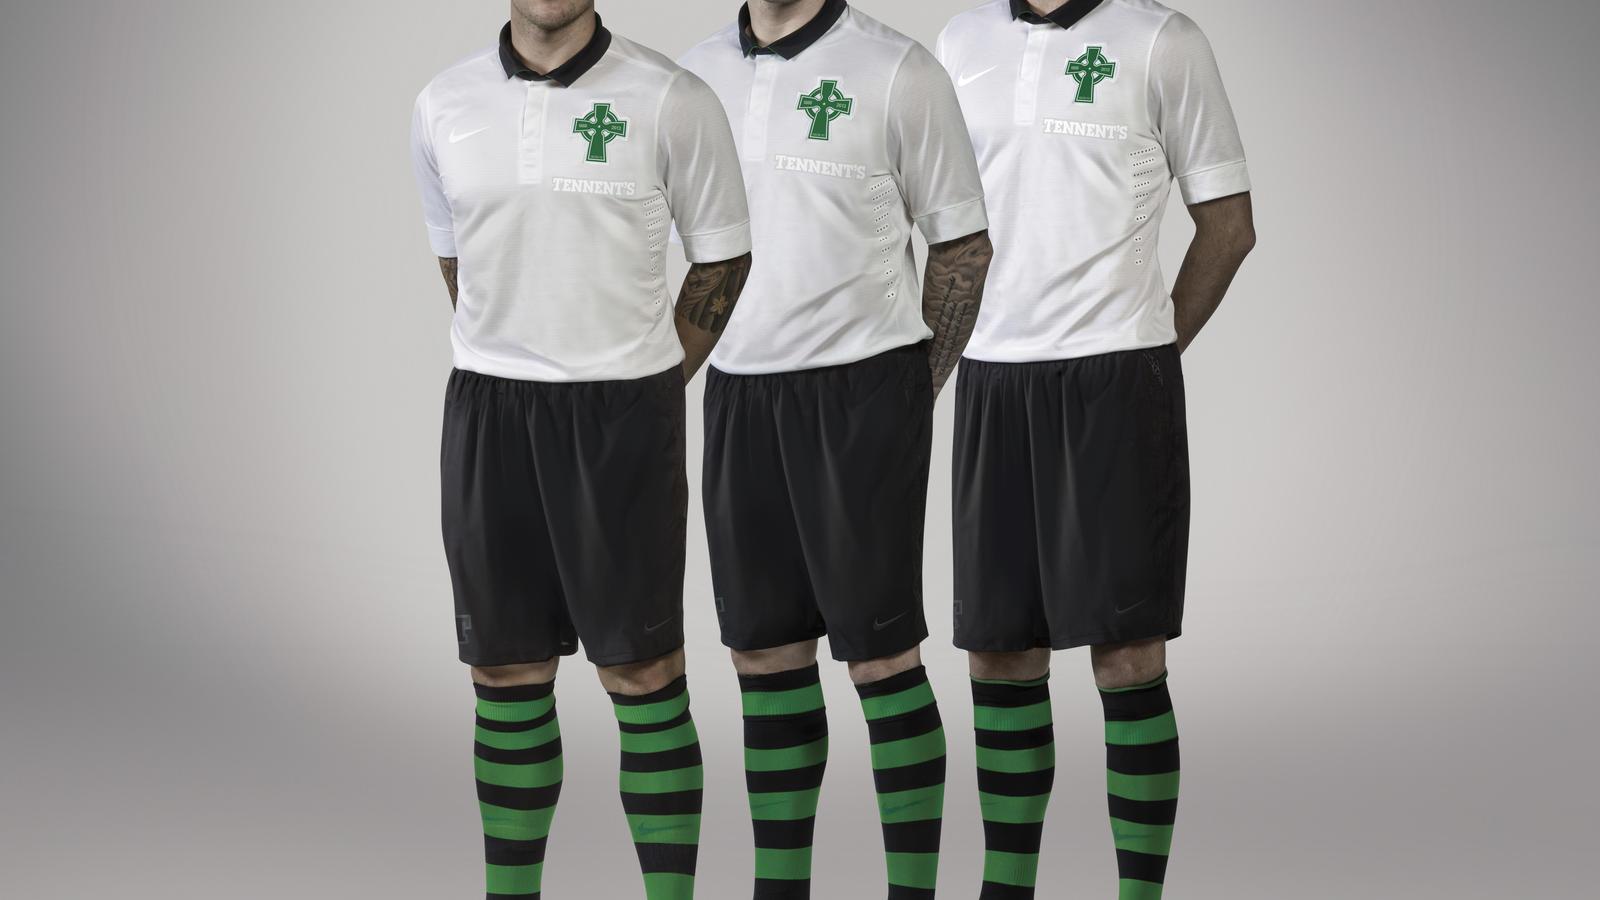 big sale a4763 c9989 Celtic Football Club Launch 125th anniversary kit - Nike News